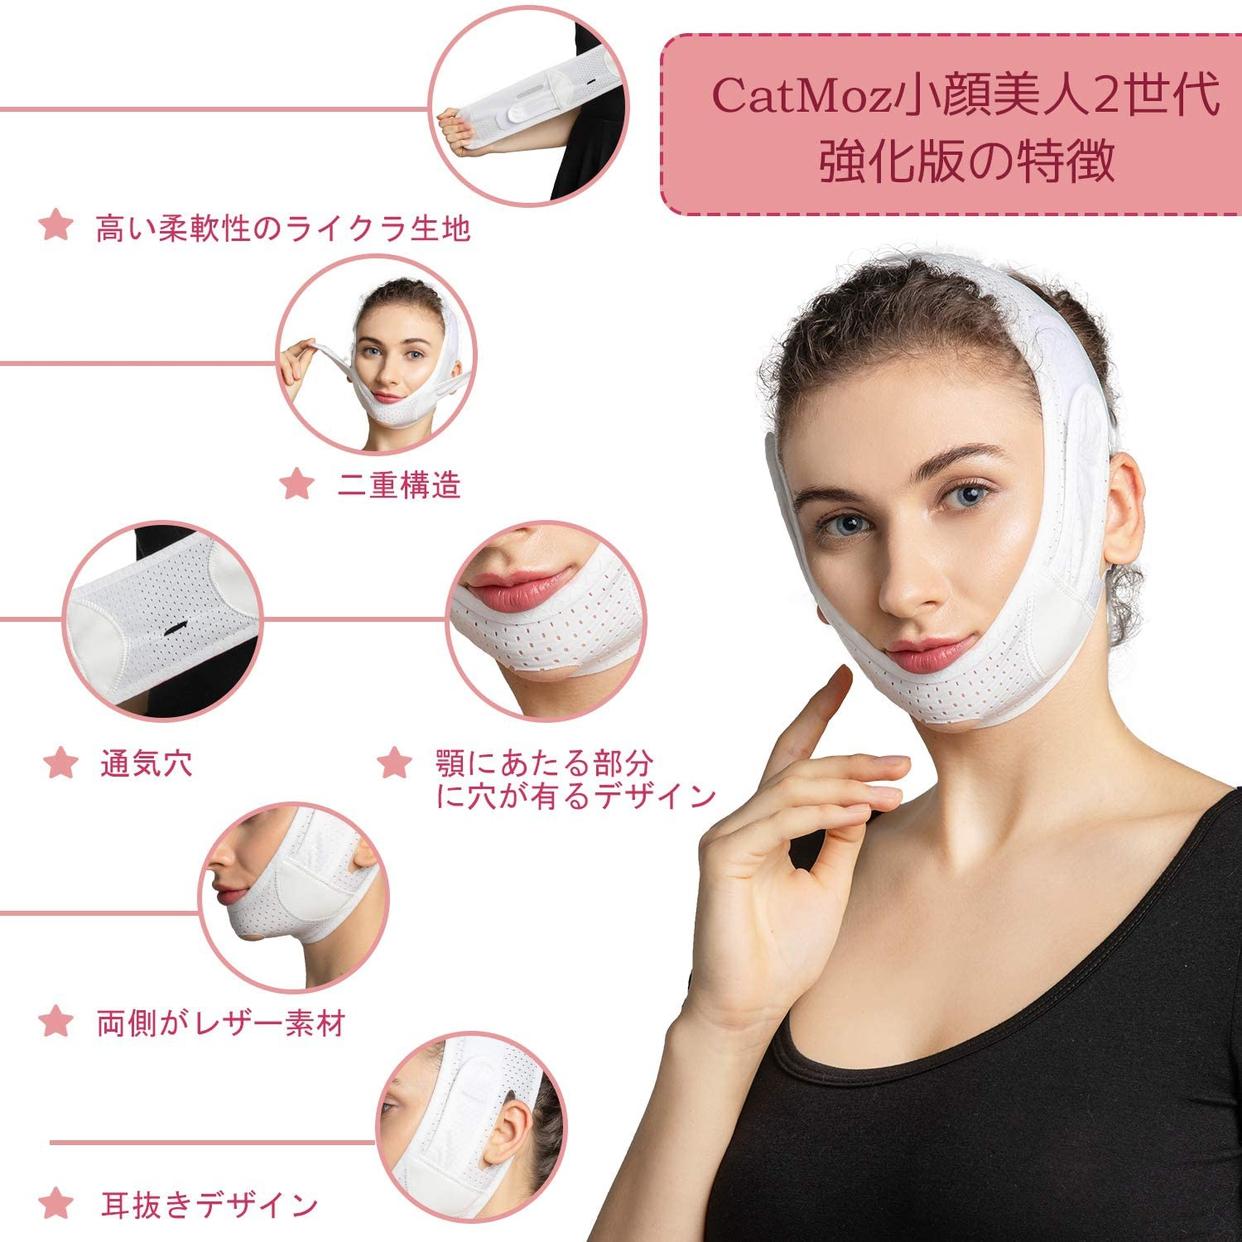 CatMoz(キャットモズ) 小顔美人第2世強化版 101010-0000の商品画像2